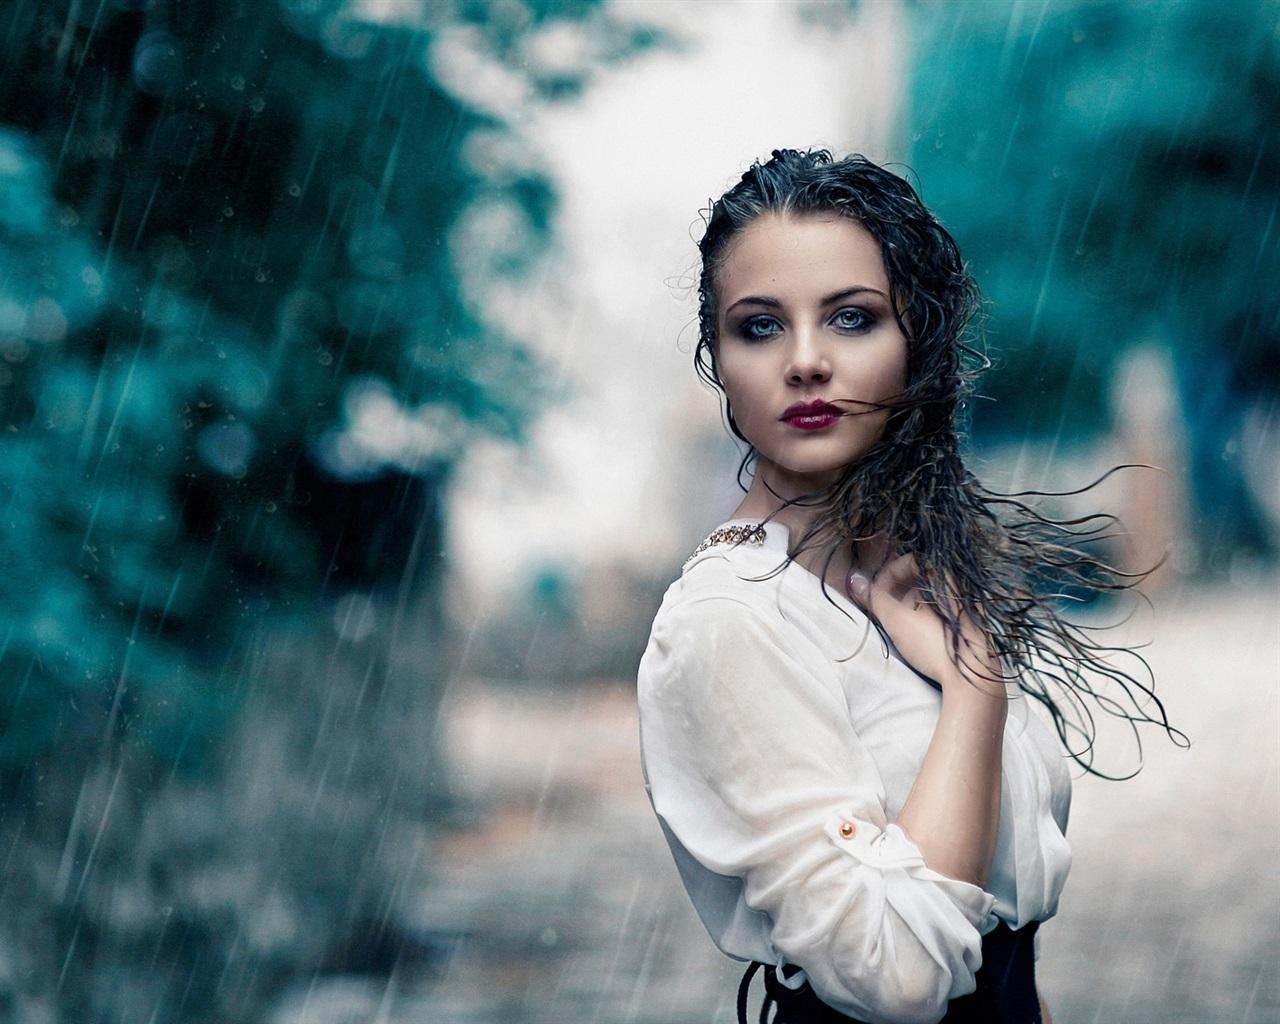 Wallpaper White Dress Girl In Rain, Wet 1920x1200 HD